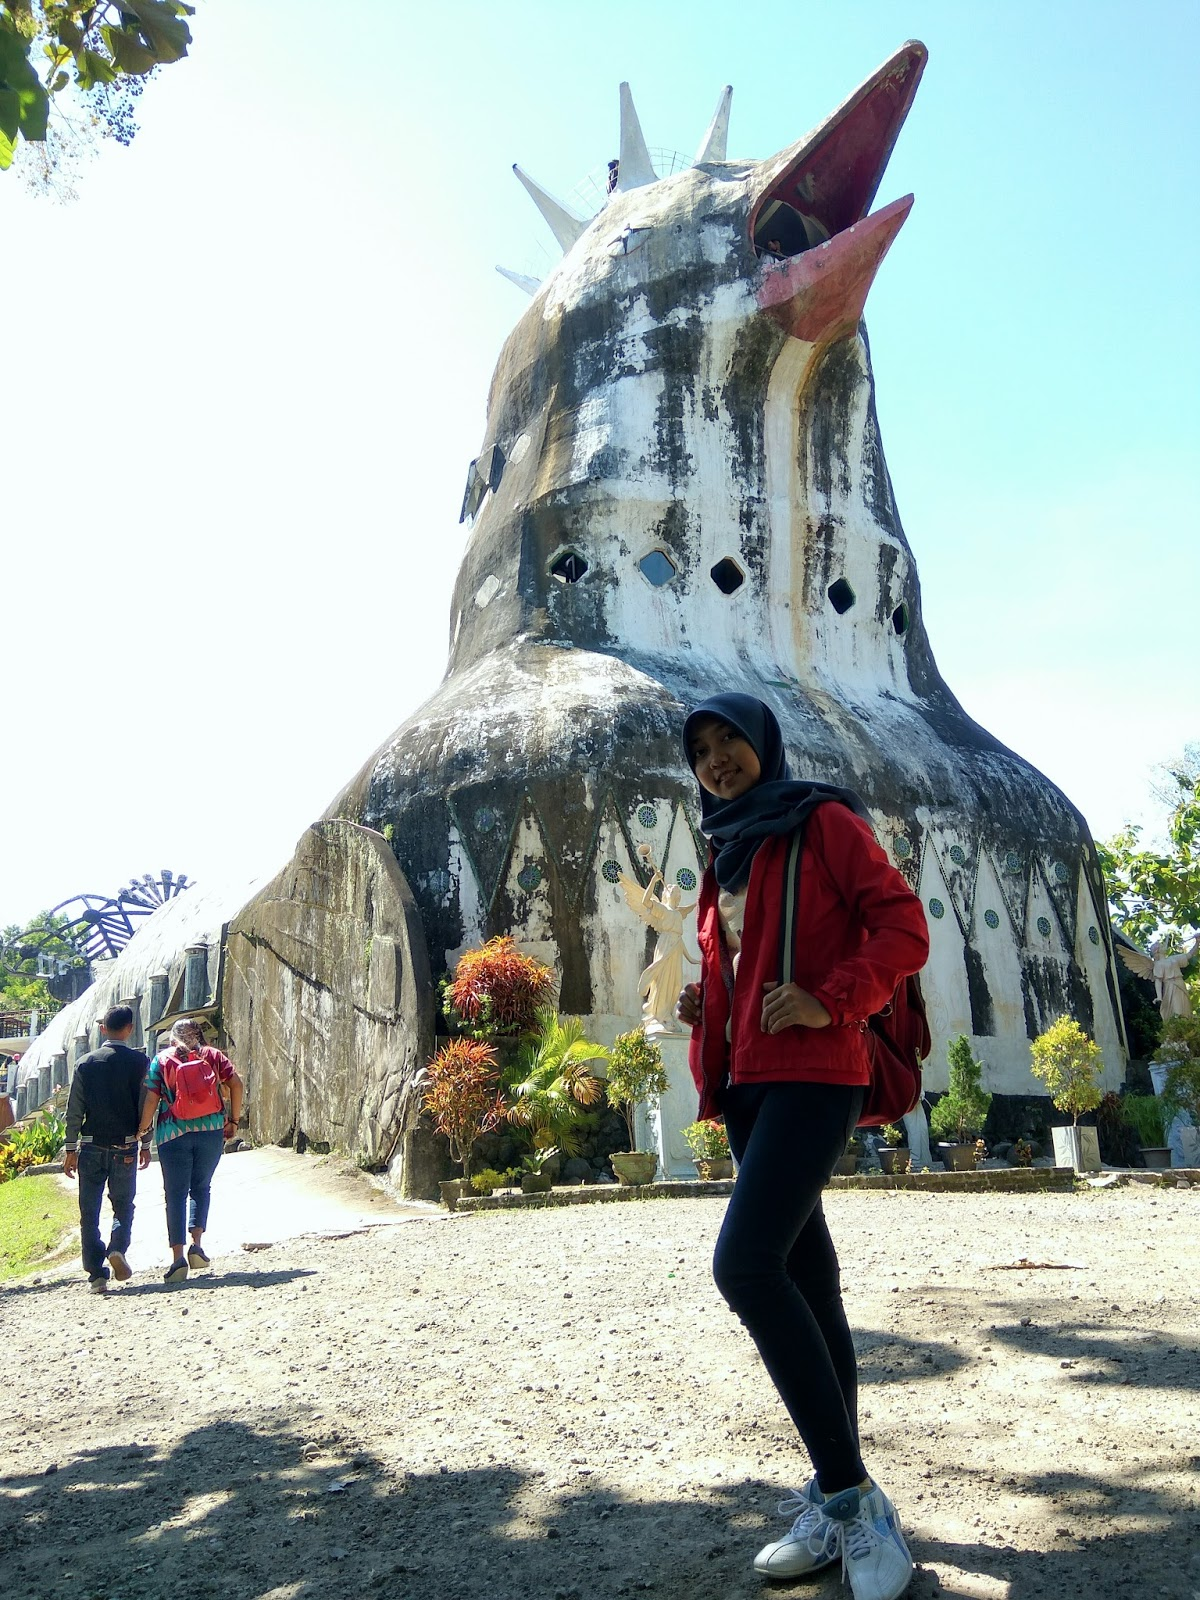 Gereja Ayam Bukit Rhema Magelang Triharyono Terletak Kabupaten Jawa Tengah